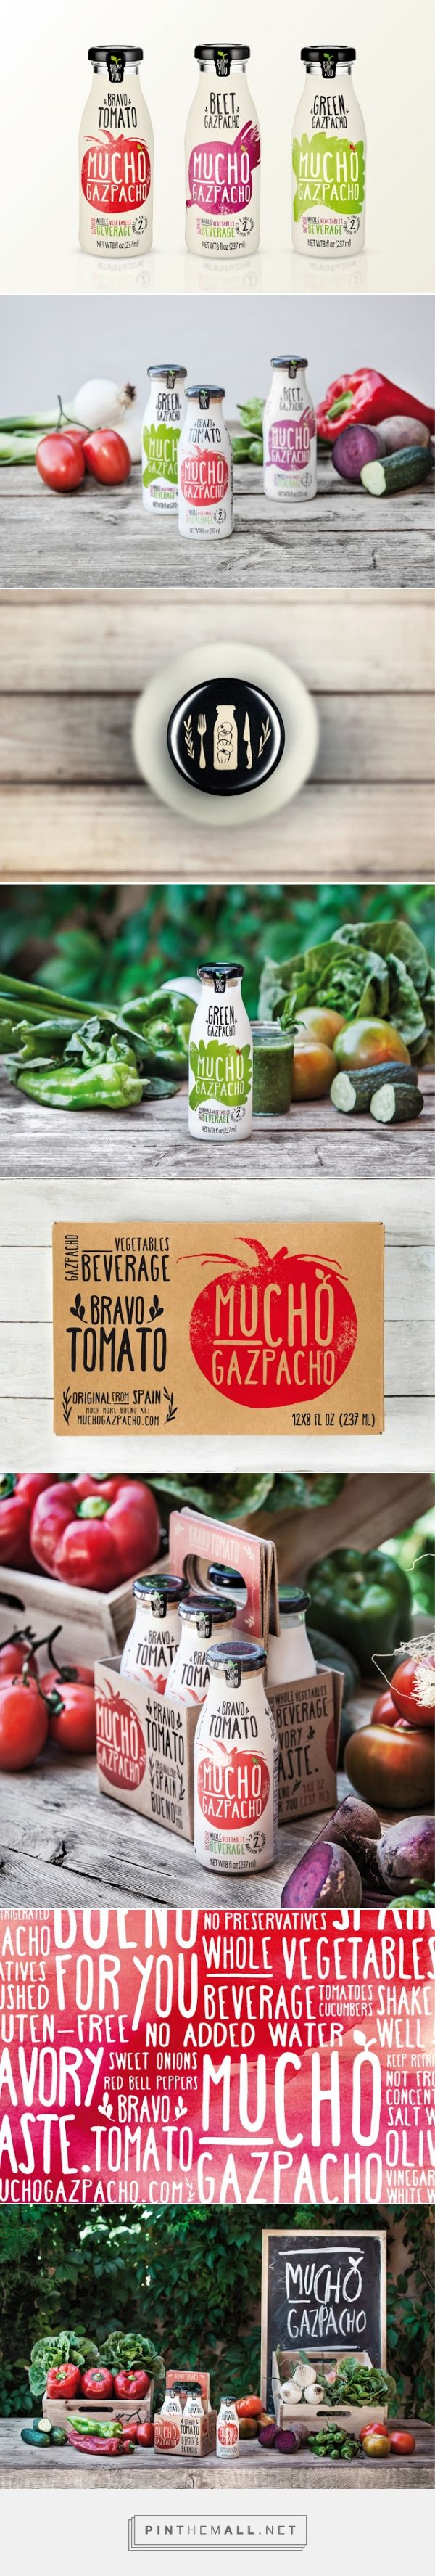 Mucho Gazpacho beverage packaging designed by Estudio Versus - http://www.packagingoftheworld.com/2015/08/mucho-gazpacho.html